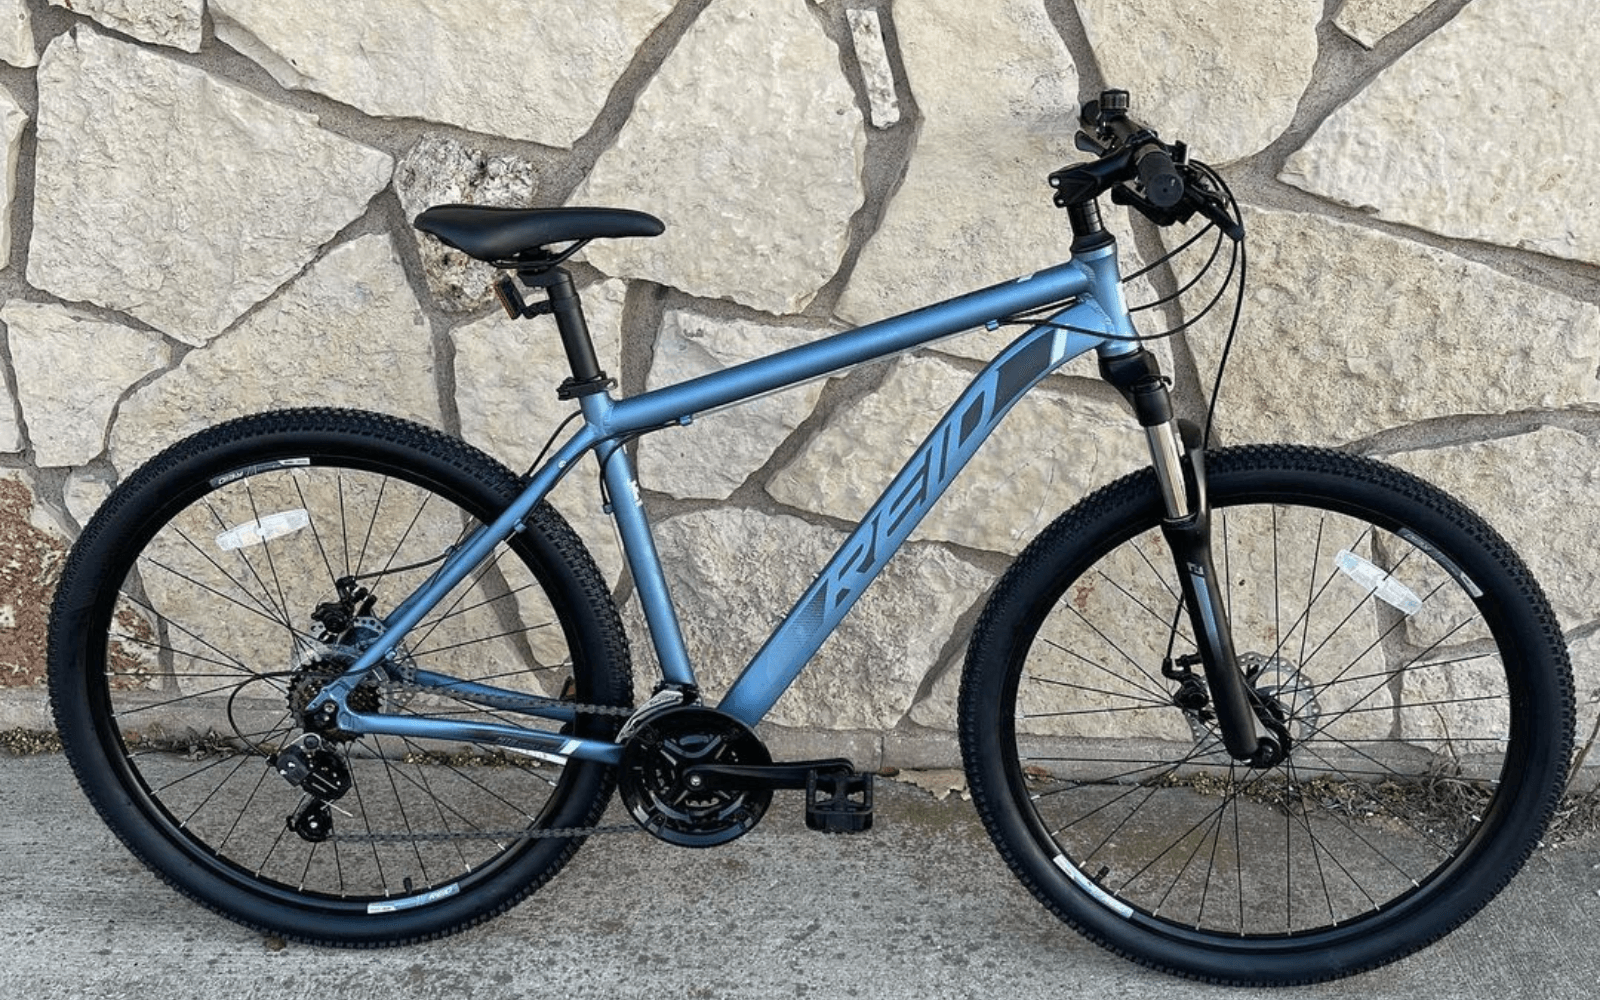 Copy of Copy of Lifestyle images 35 1 - Reid ® - MTB Sport Disc Bike